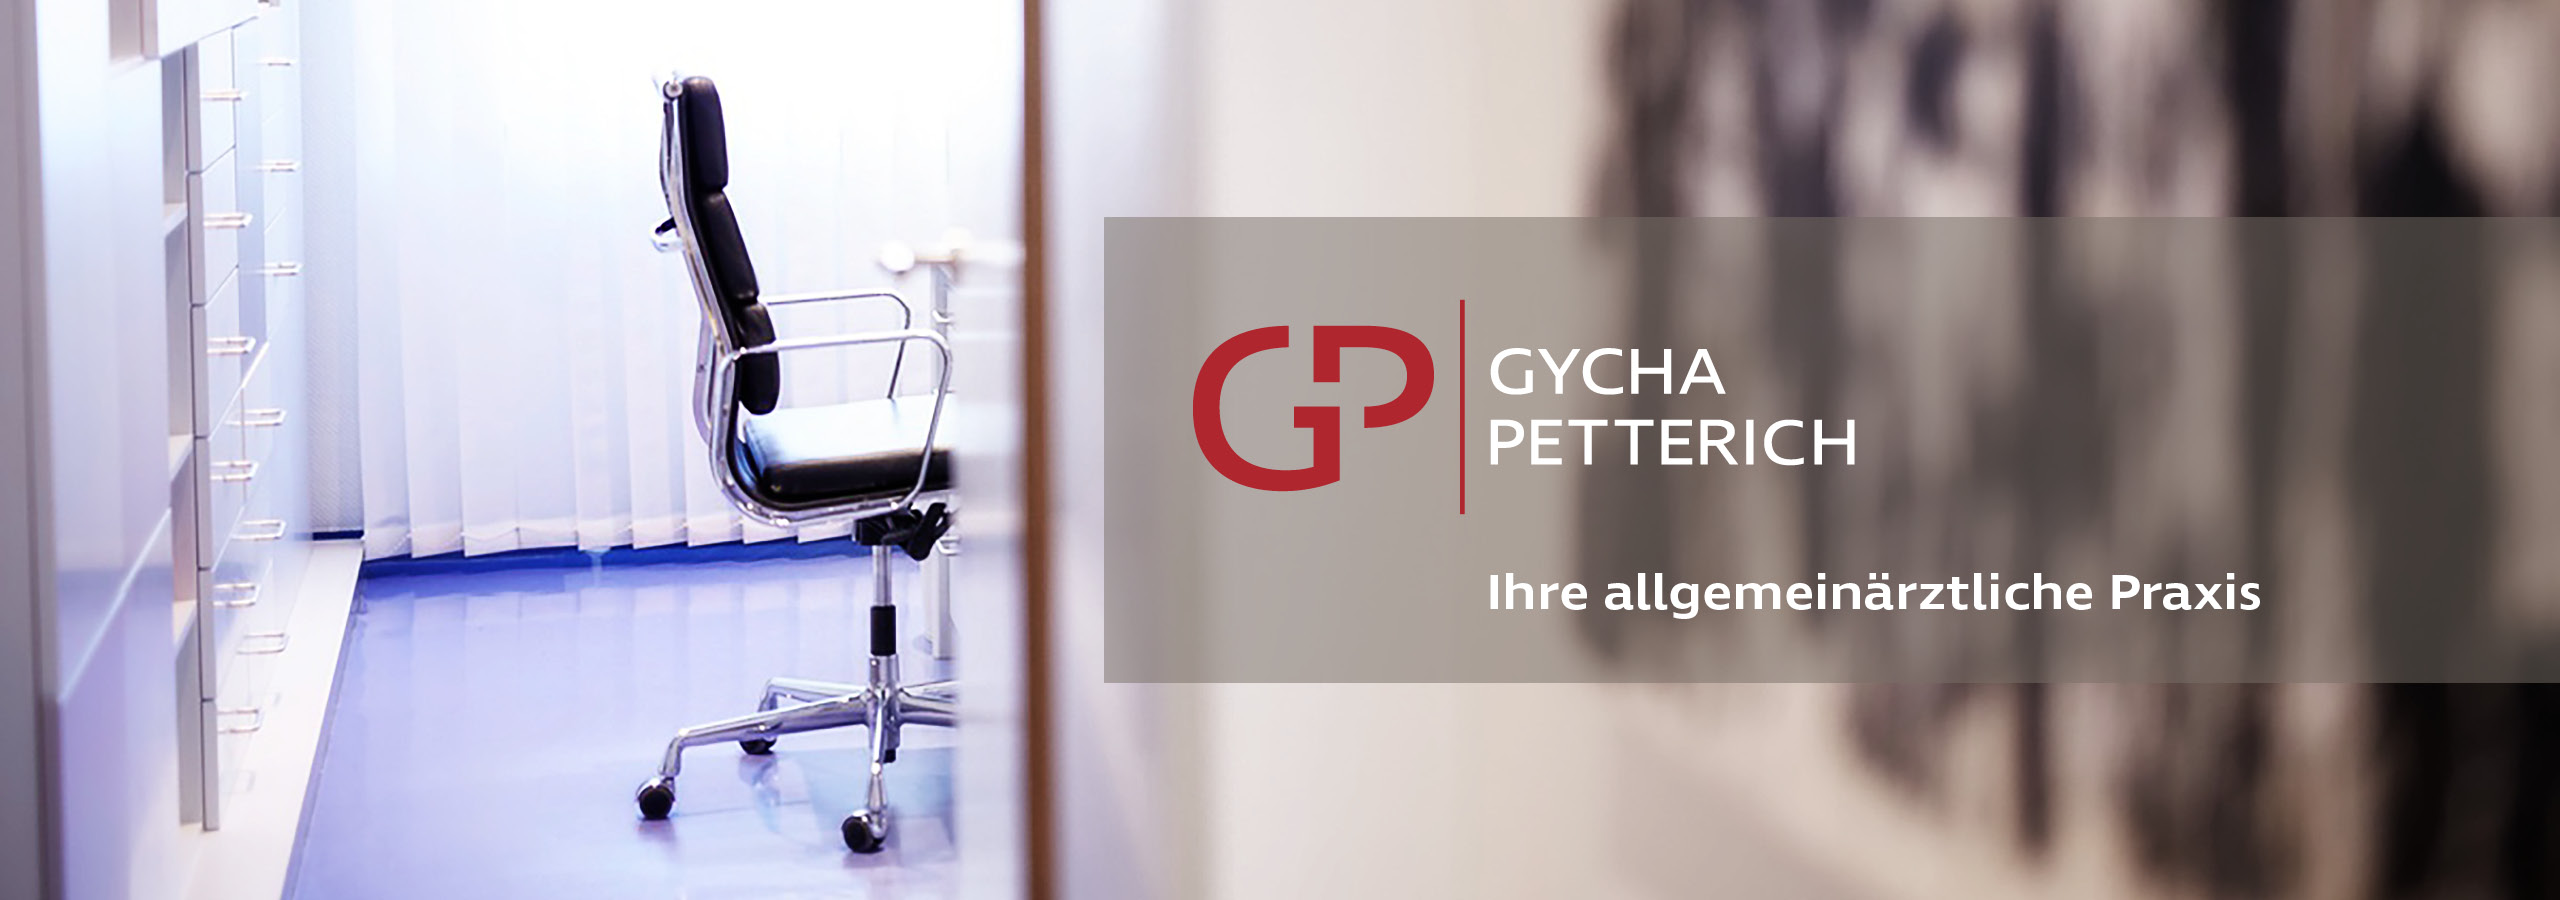 Praxis für Allgemeinmedizin Gycha | Petterich